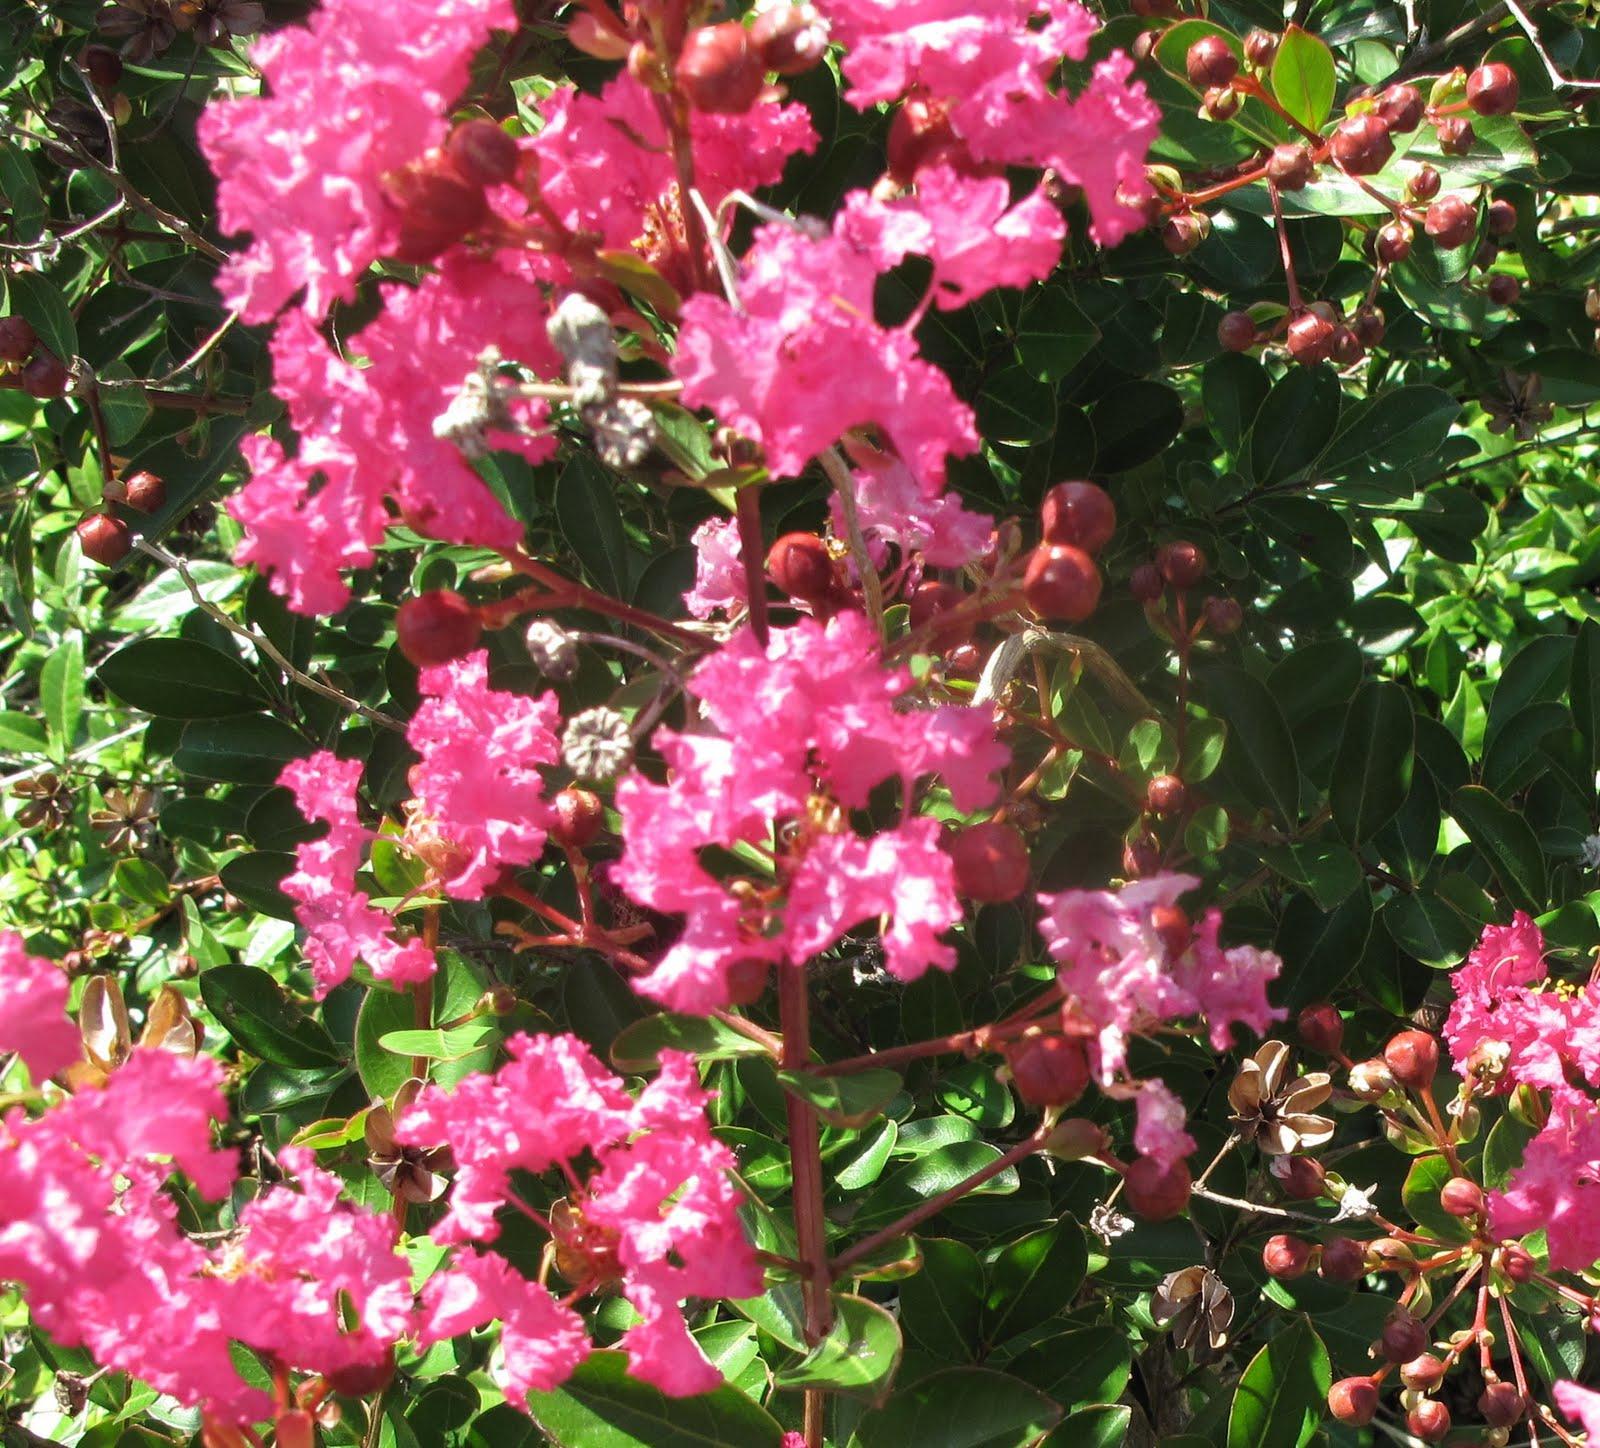 http://3.bp.blogspot.com/_1tuFRR-F61M/TCvqwK1ZJeI/AAAAAAAACso/Wg6RlnILVFg/s1600/pink+crepe+myrtle.jpg